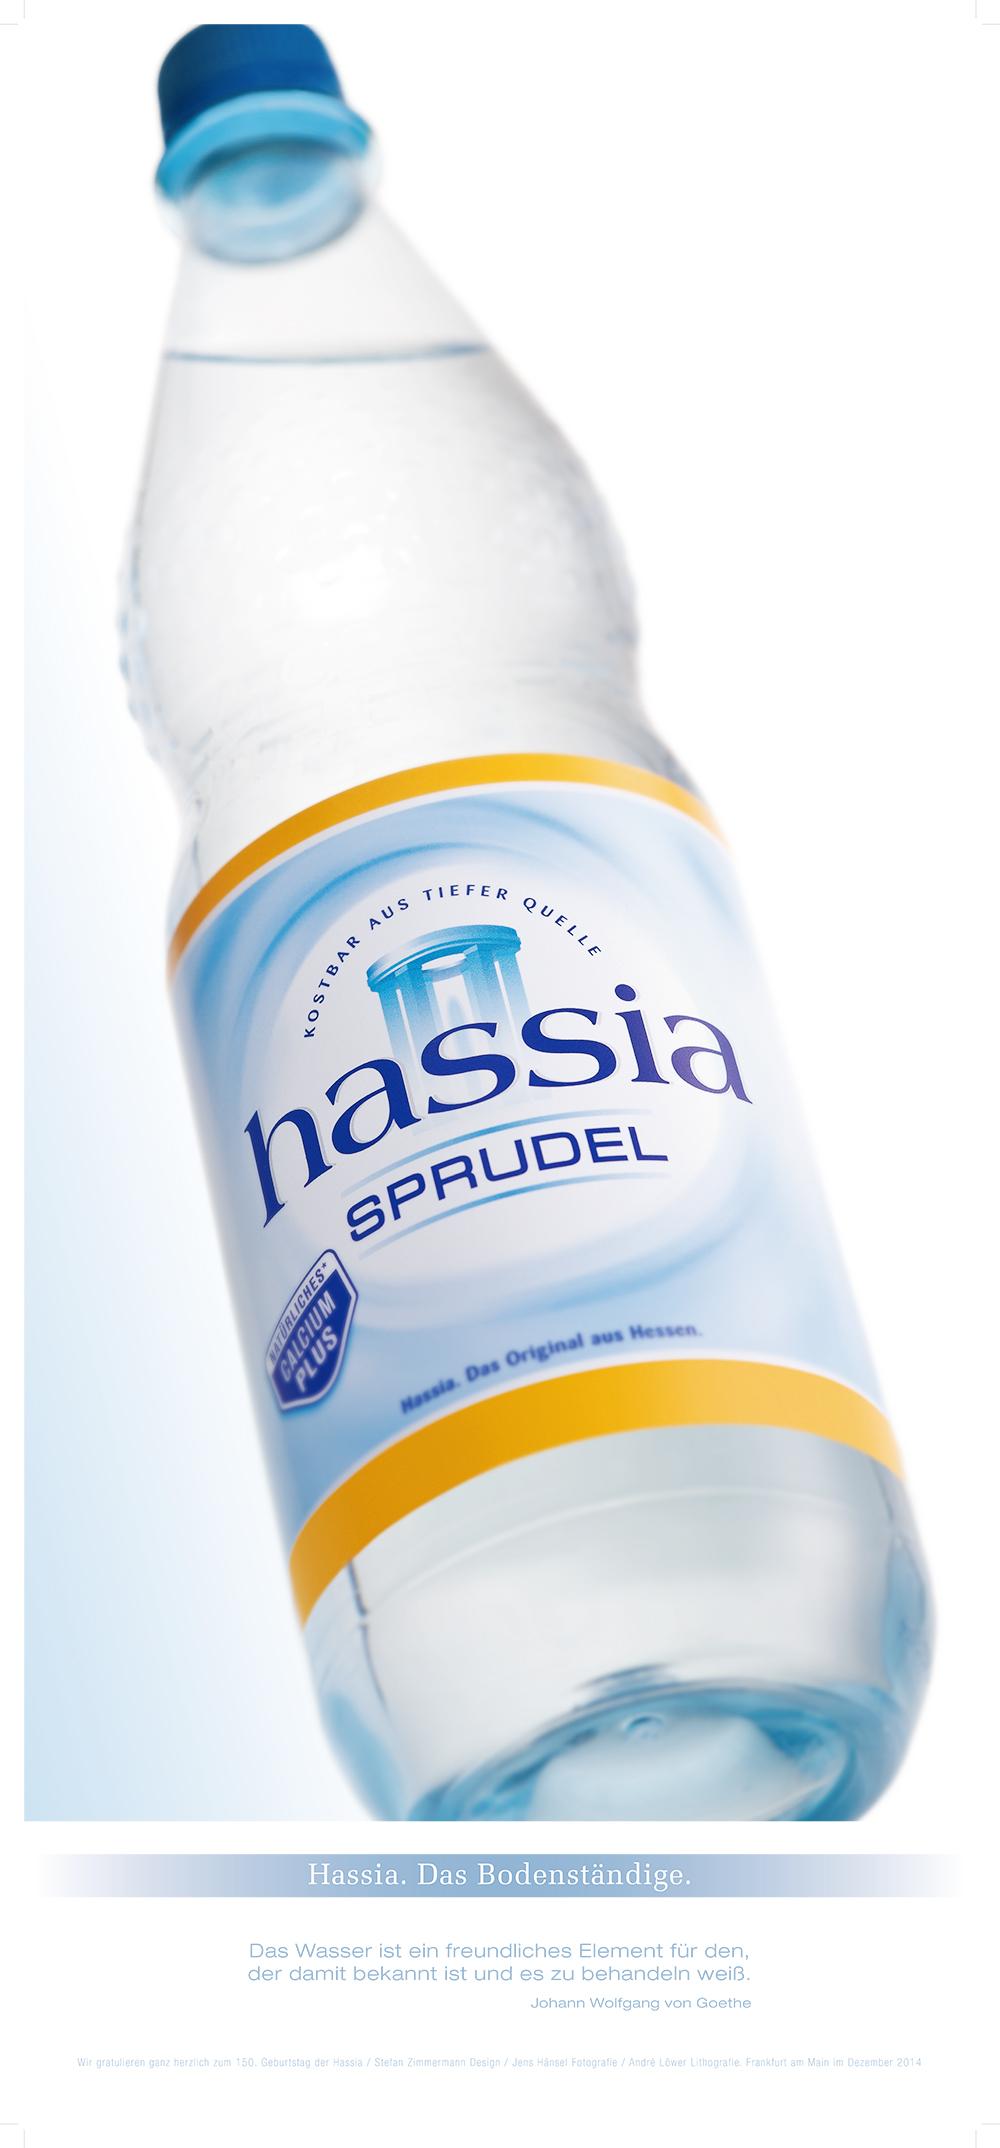 Hassia-Sprudel